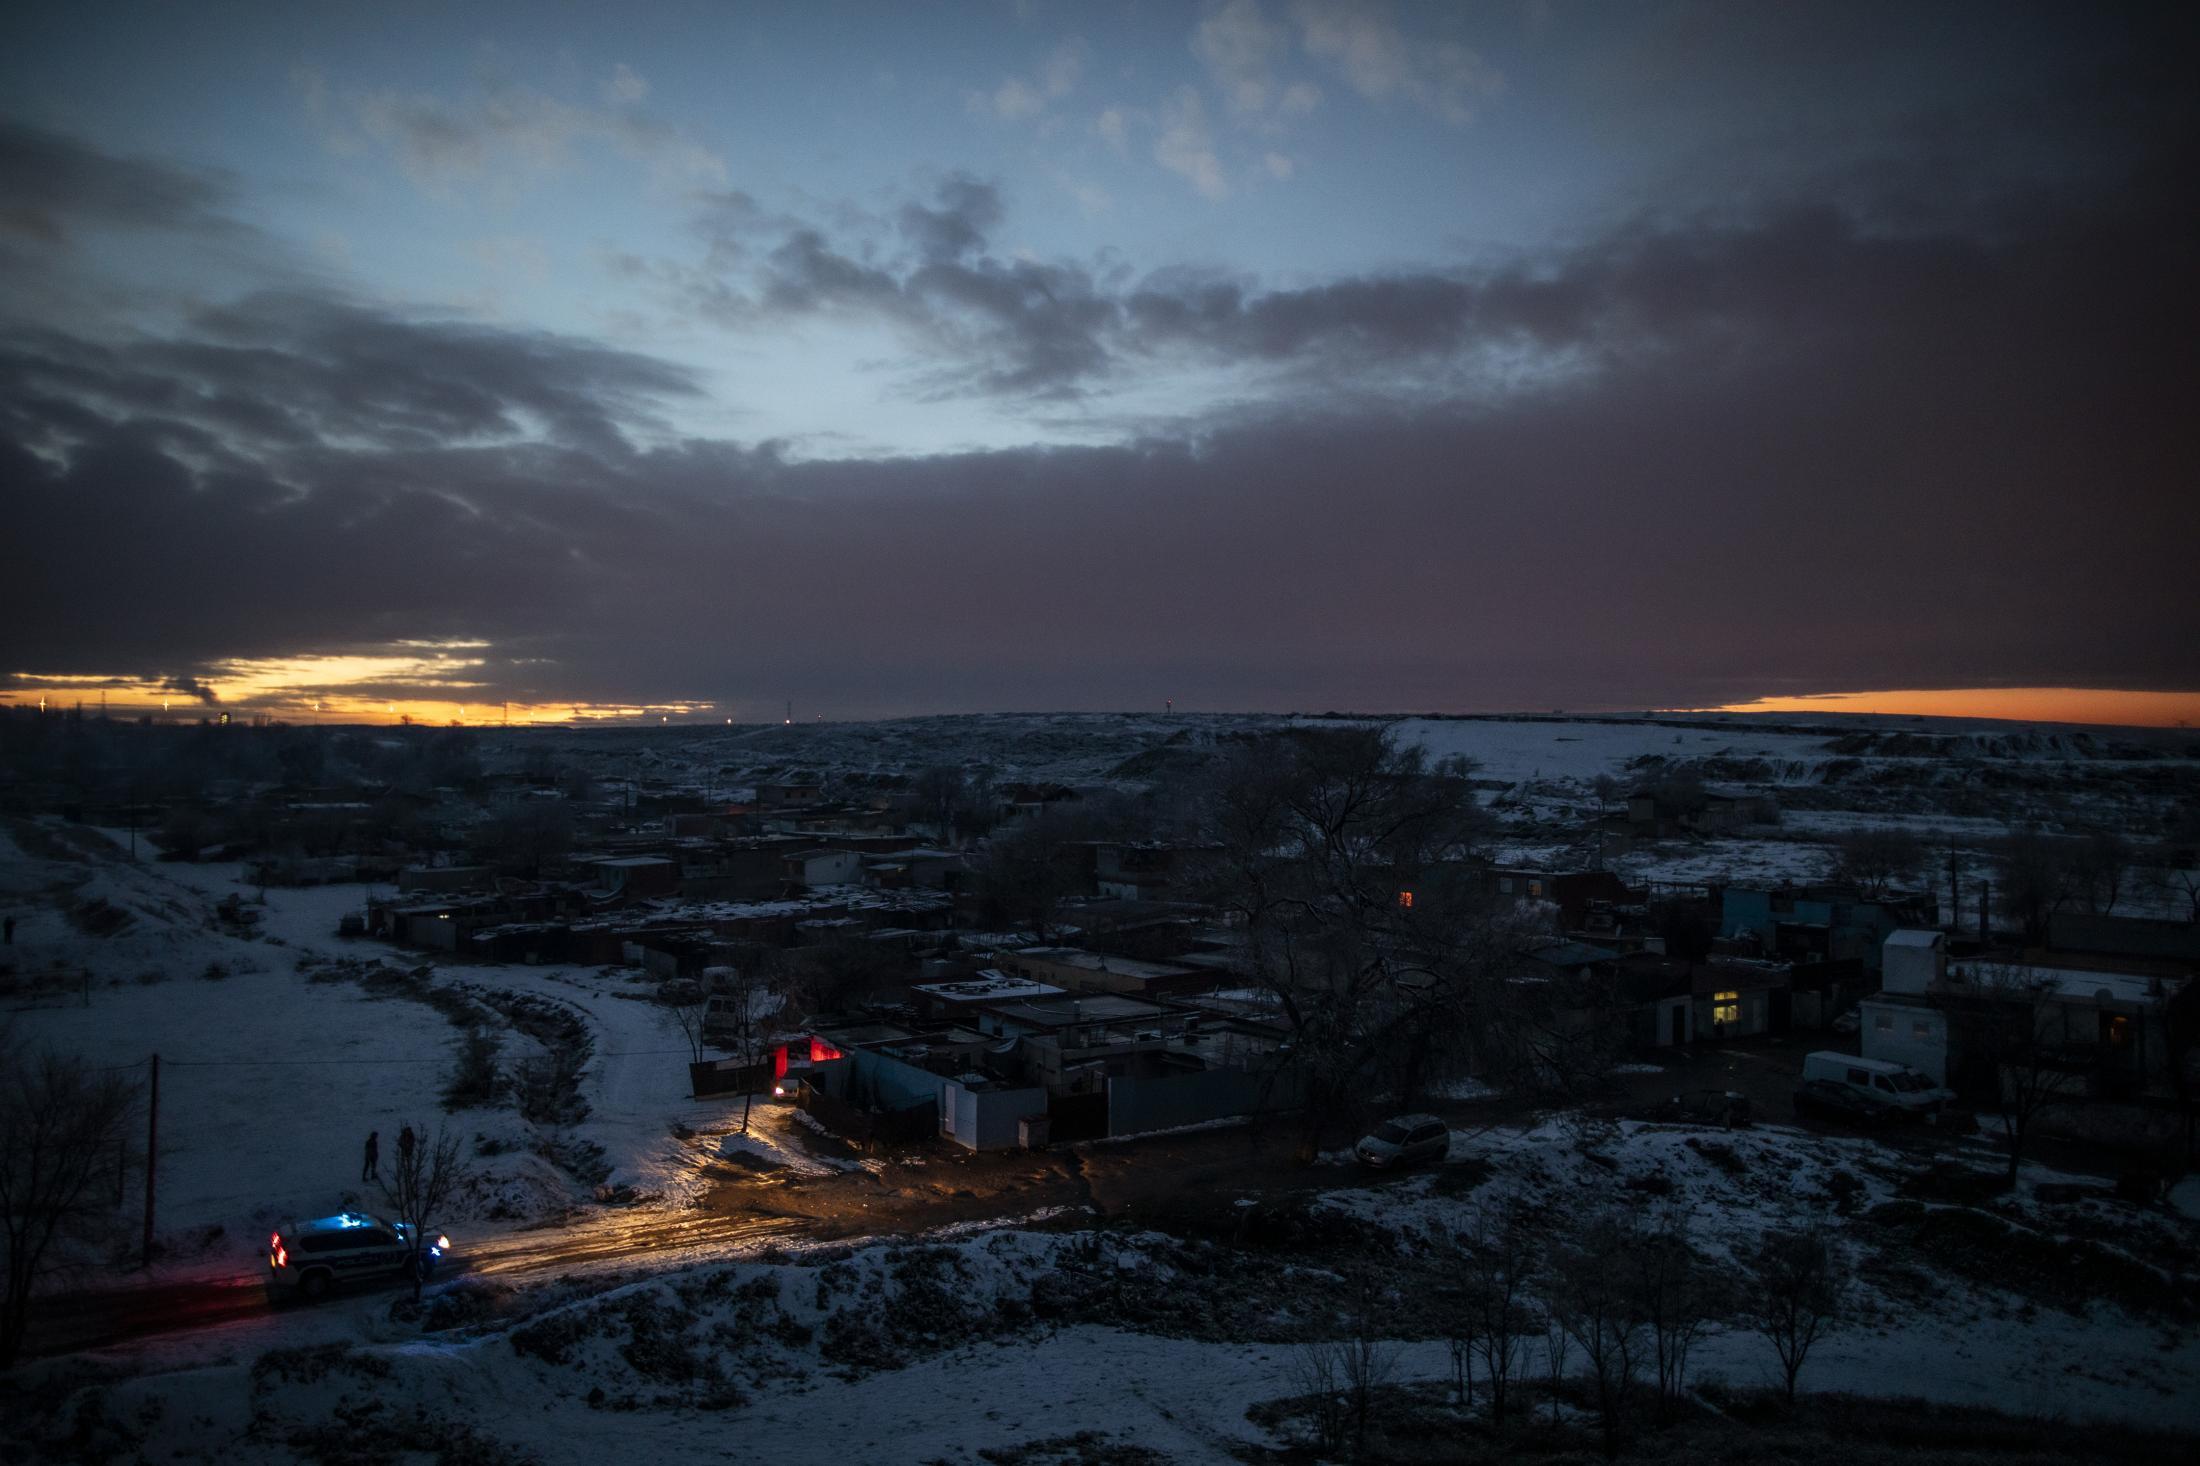 Vista del Sector VI de la Ca–ada por la noche tras el primer d'a de la nevada